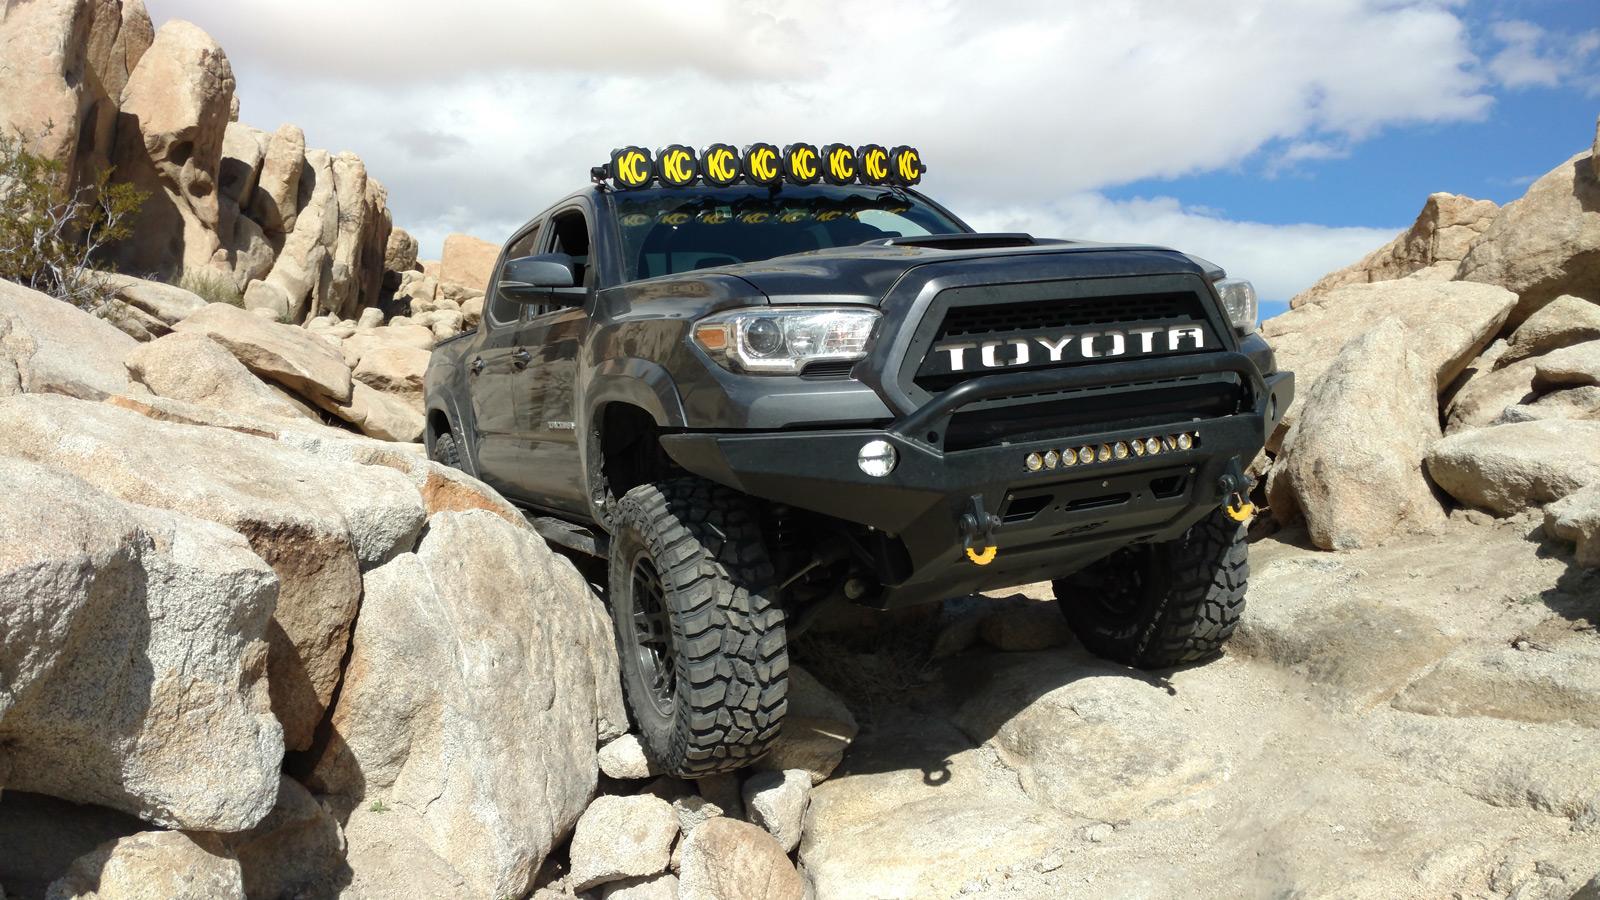 Custom Off Road Desert Stormer Toyota Tacoma - Image #03